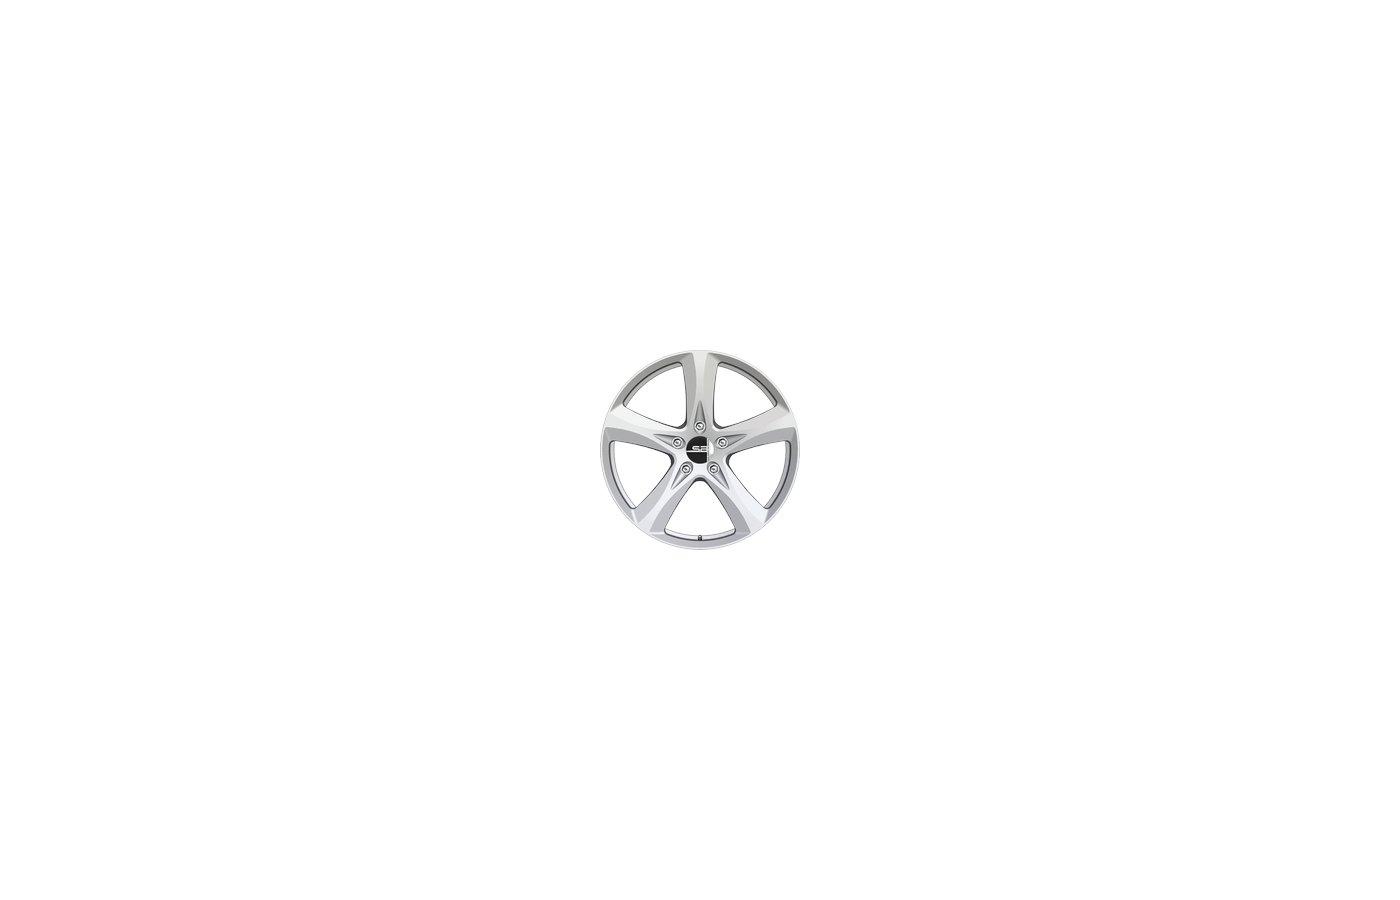 Диск OZ Racing Sardegna 9.5x20/5x120 D79 ET52 Chrystal Titanium